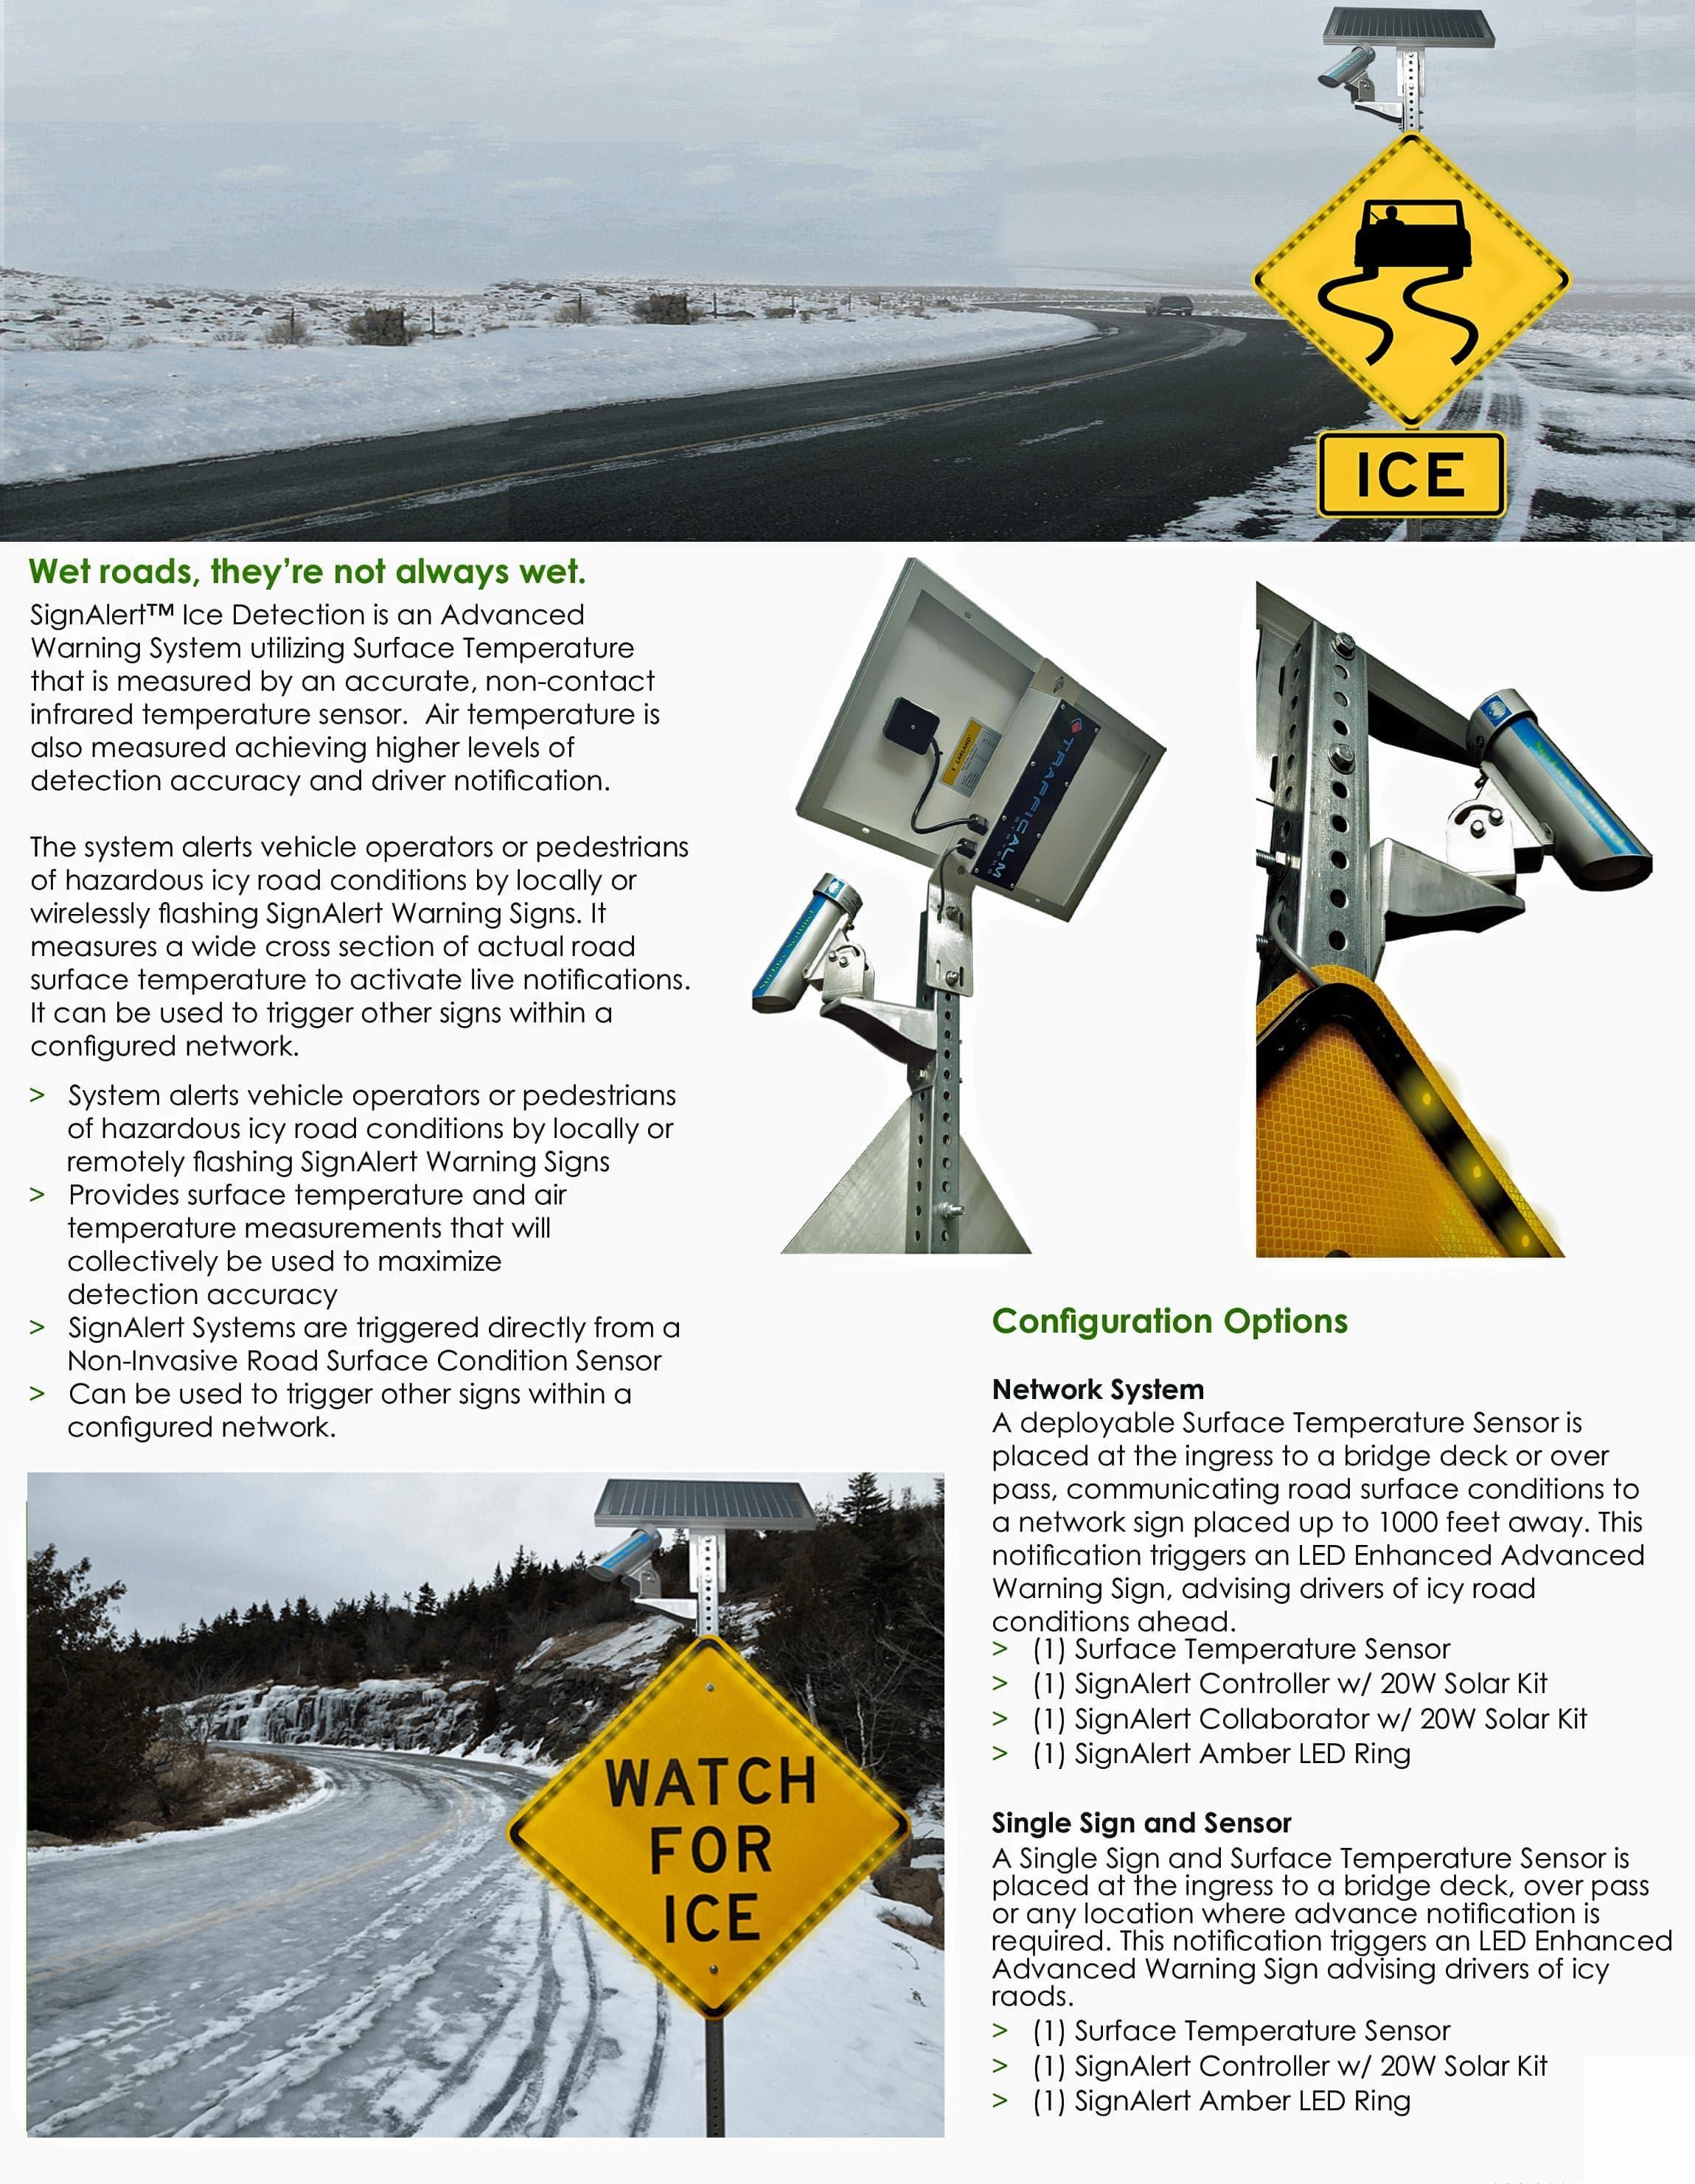 Sign Alert Ice Detection